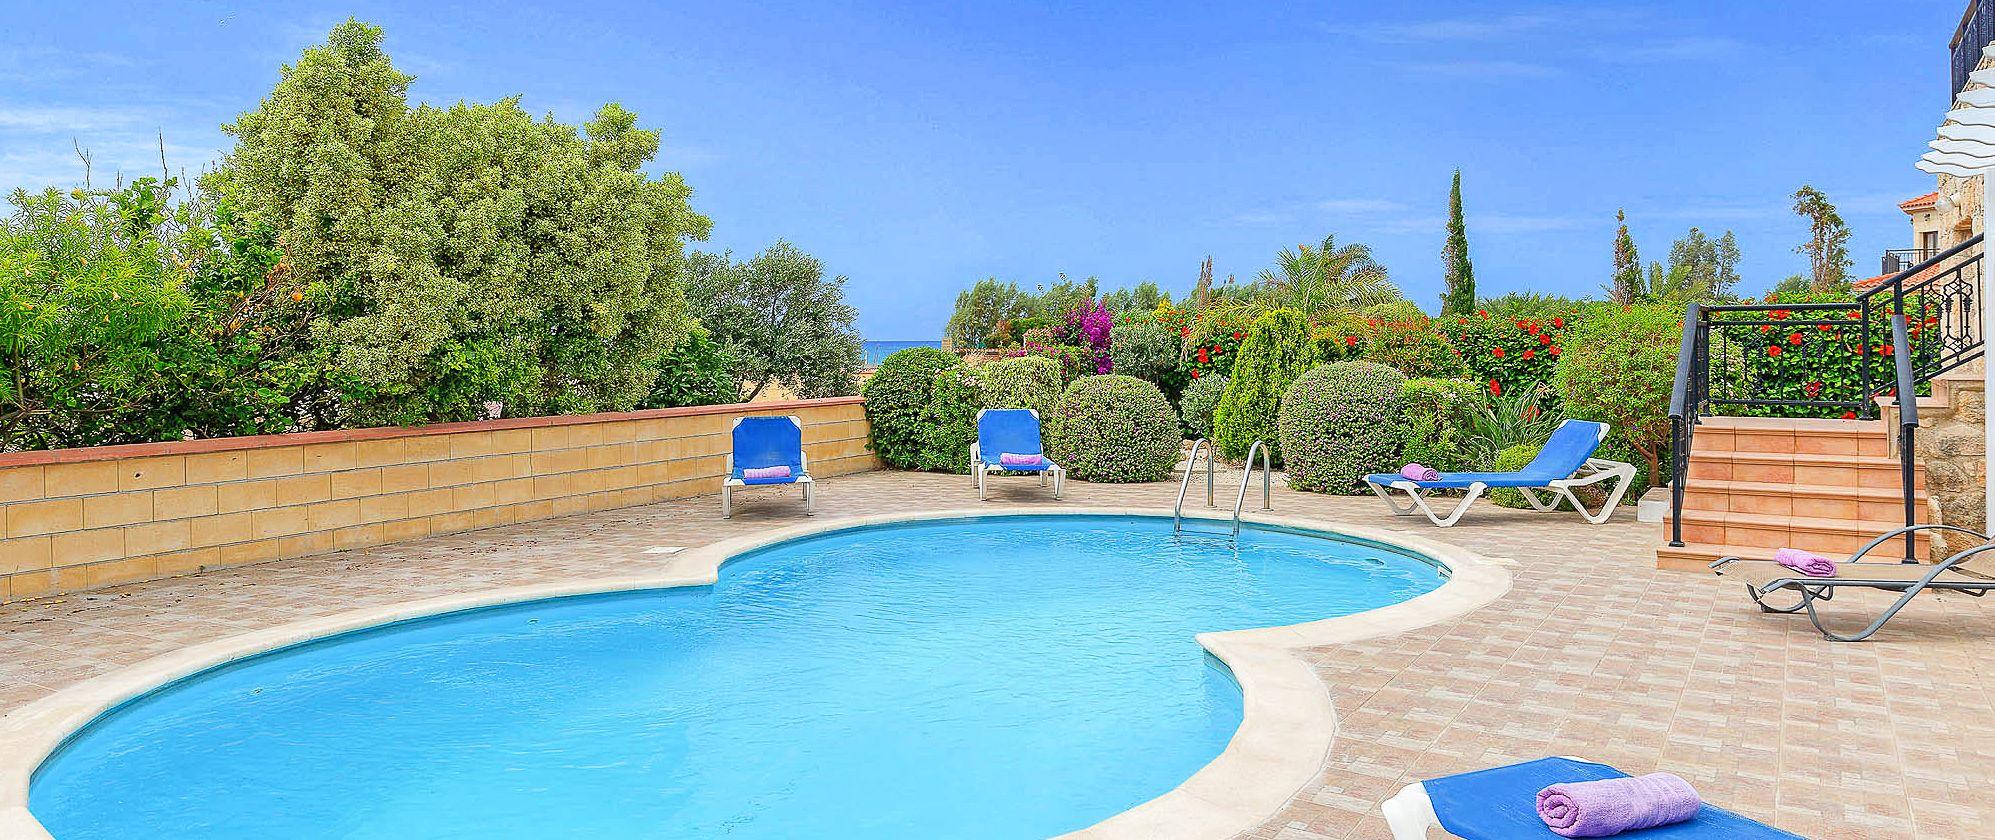 Ferienhaus-Zypern-ZYS3730-Swimmingpool